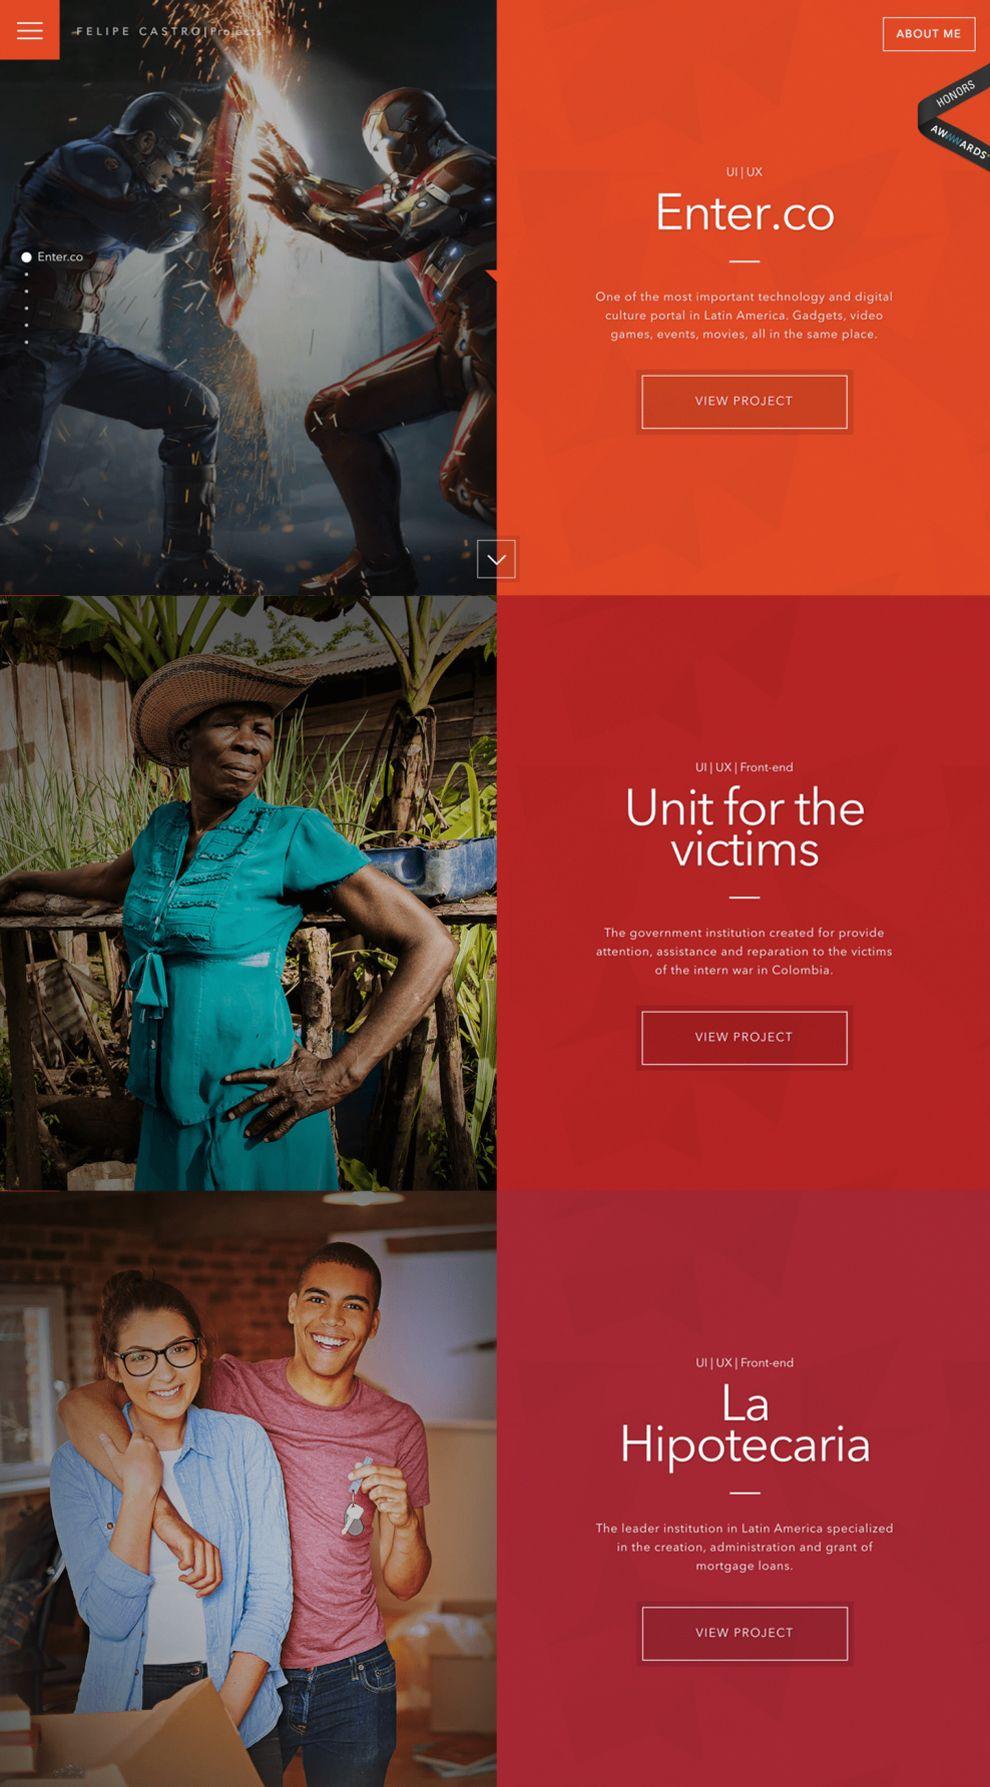 Felipe Castro Colorful Website Design